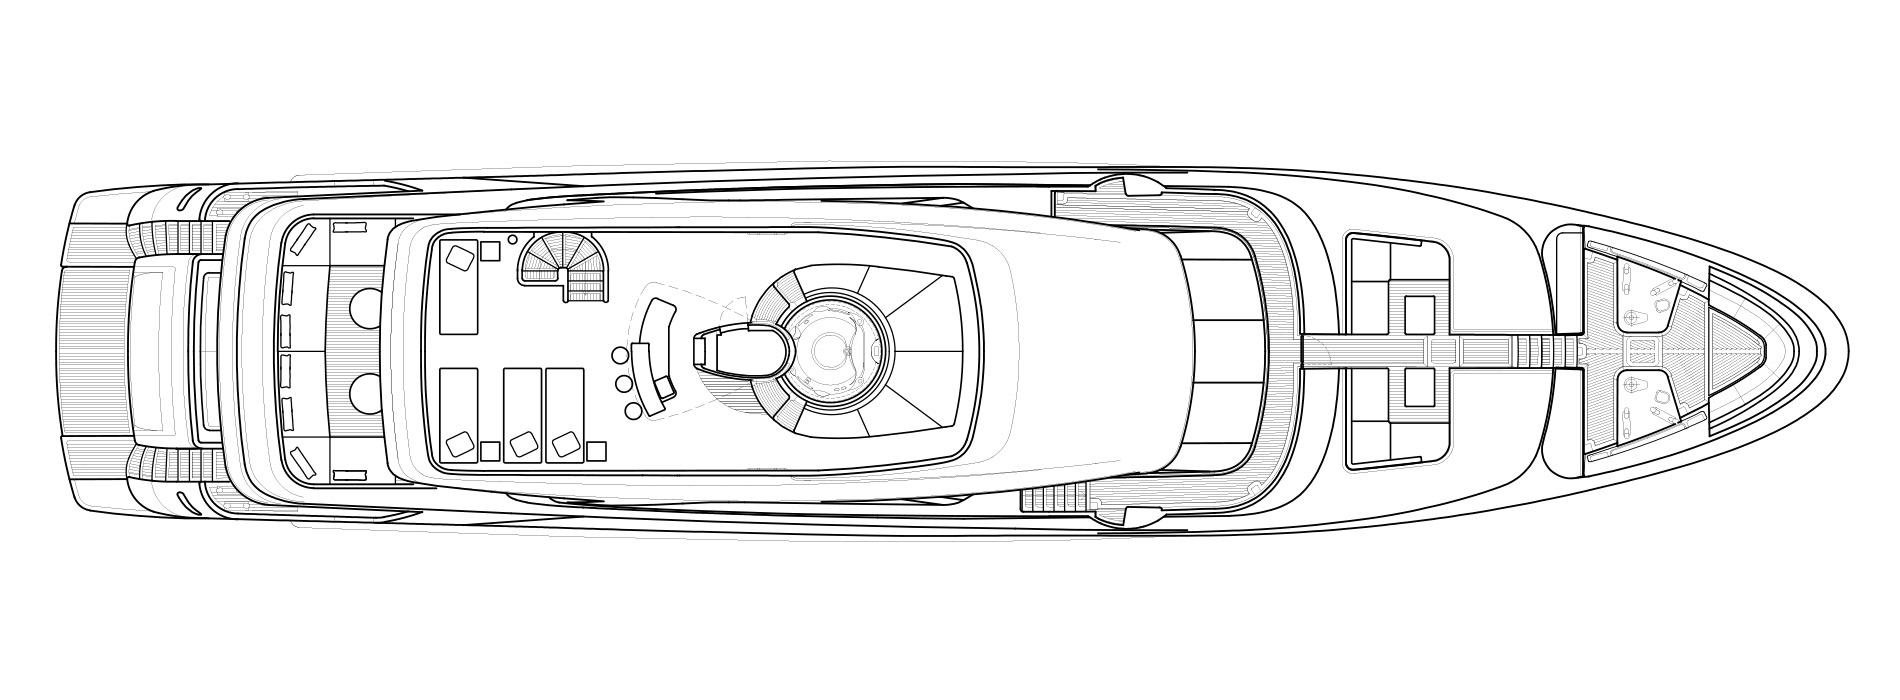 Sanlorenzo Yachts SD126 Flying bridge Versione A